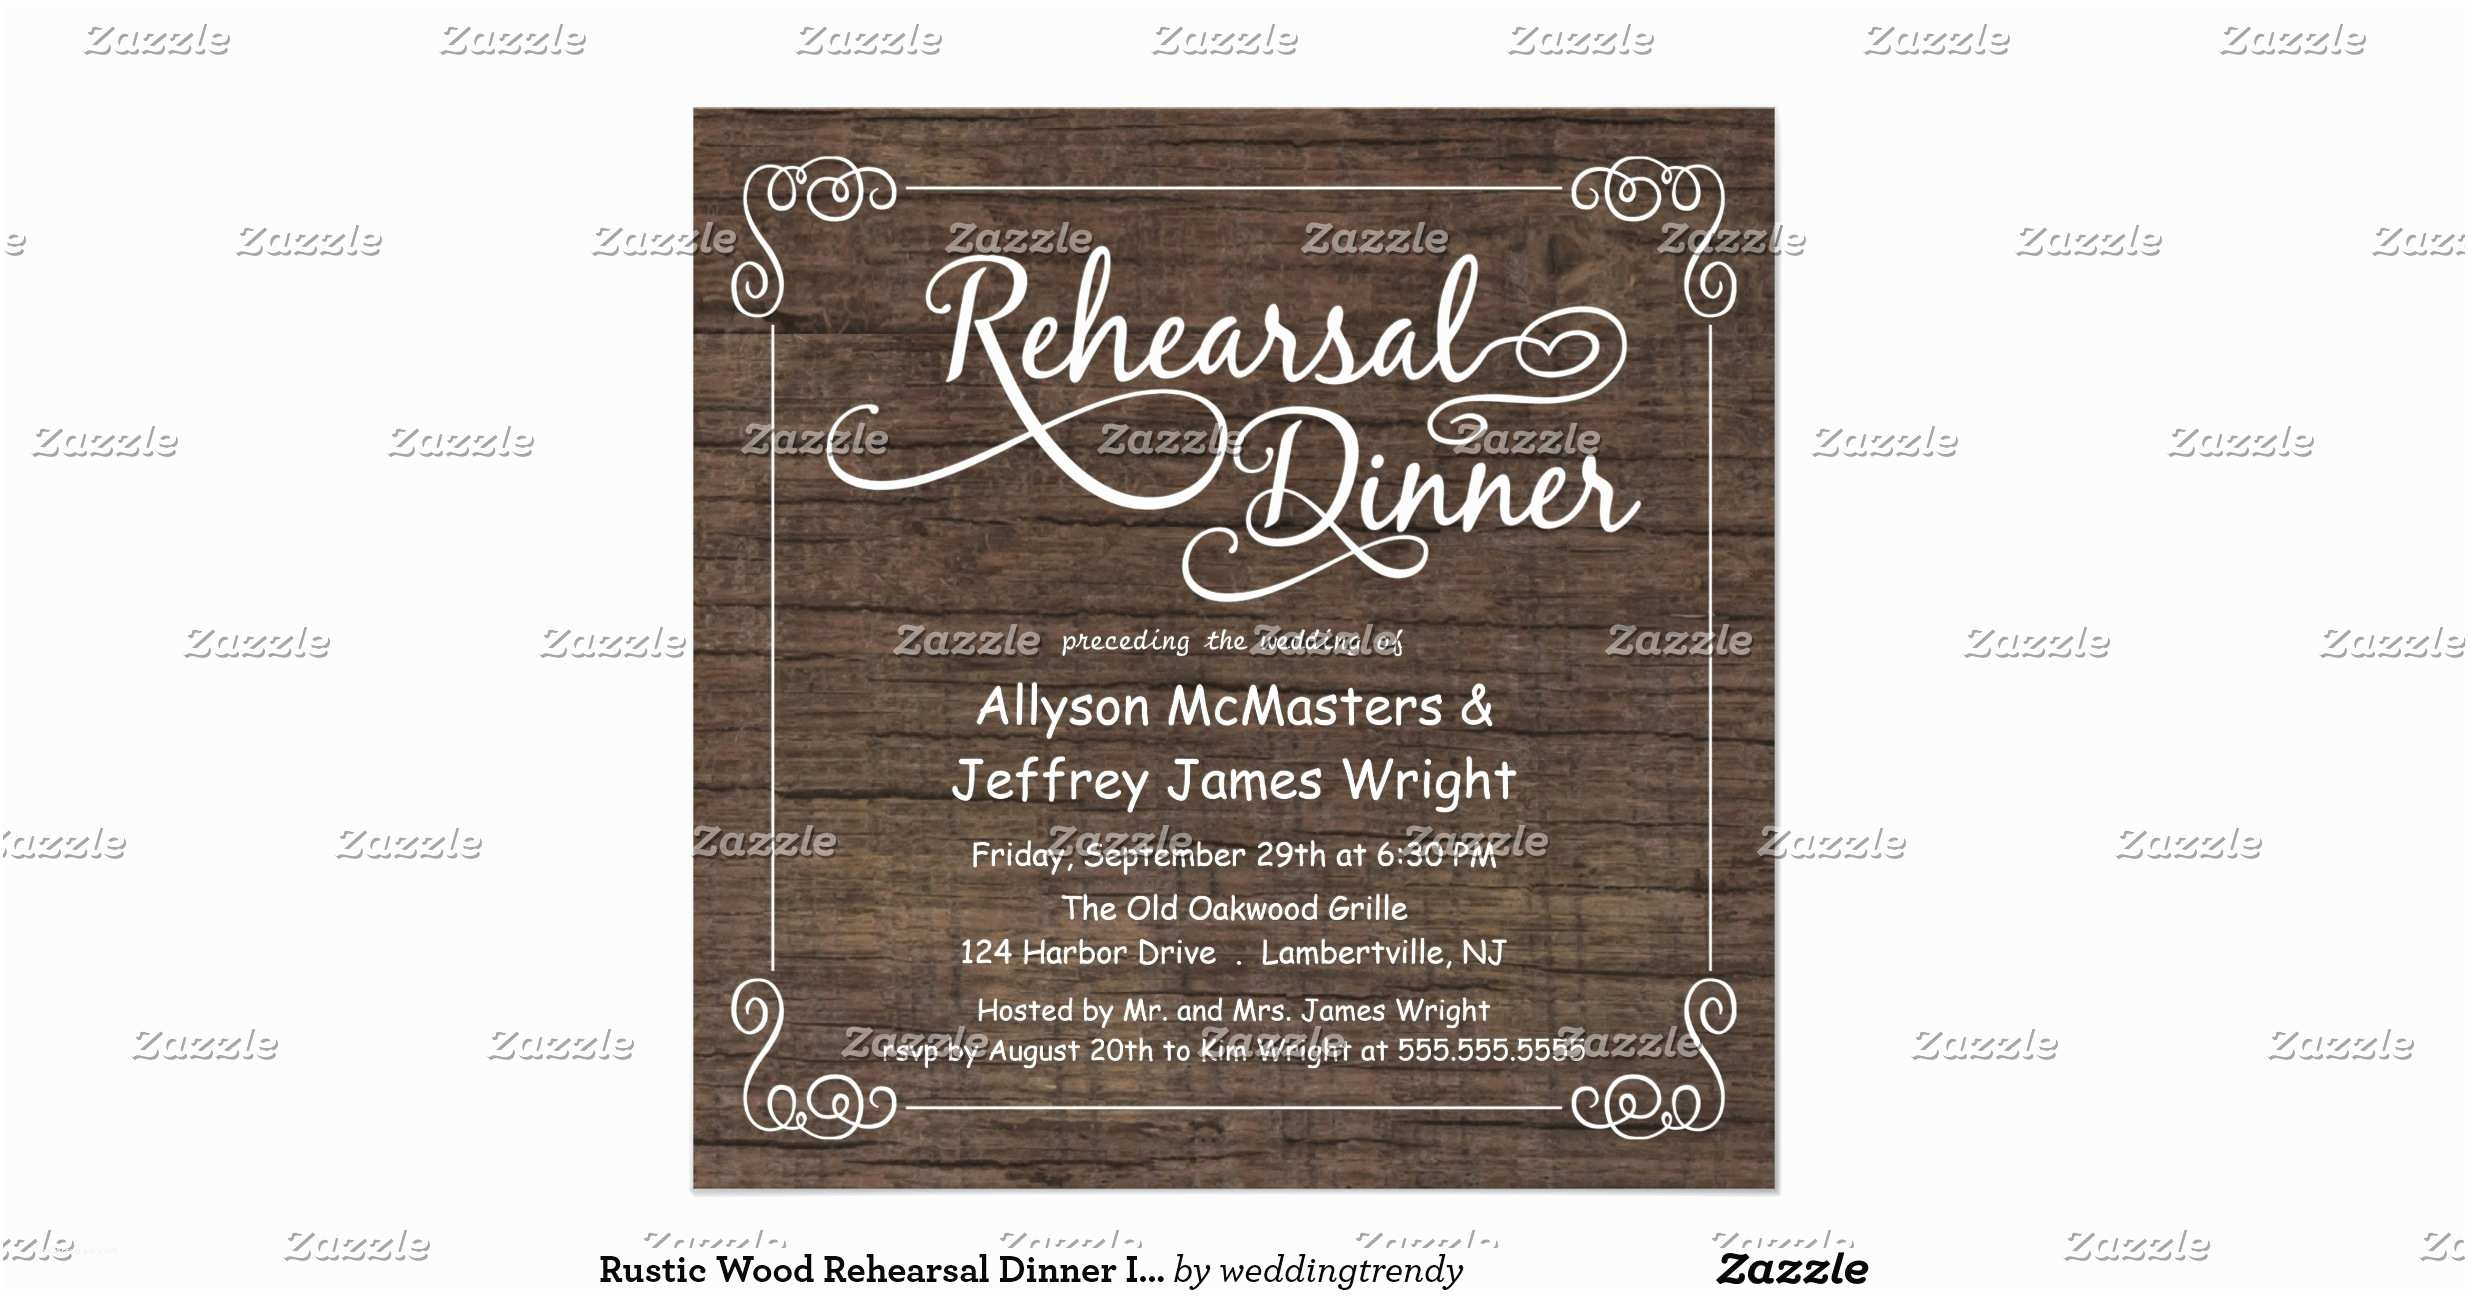 Rustic Rehearsal Dinner Invitations Rustic Wood Rehearsal Dinner Invitations